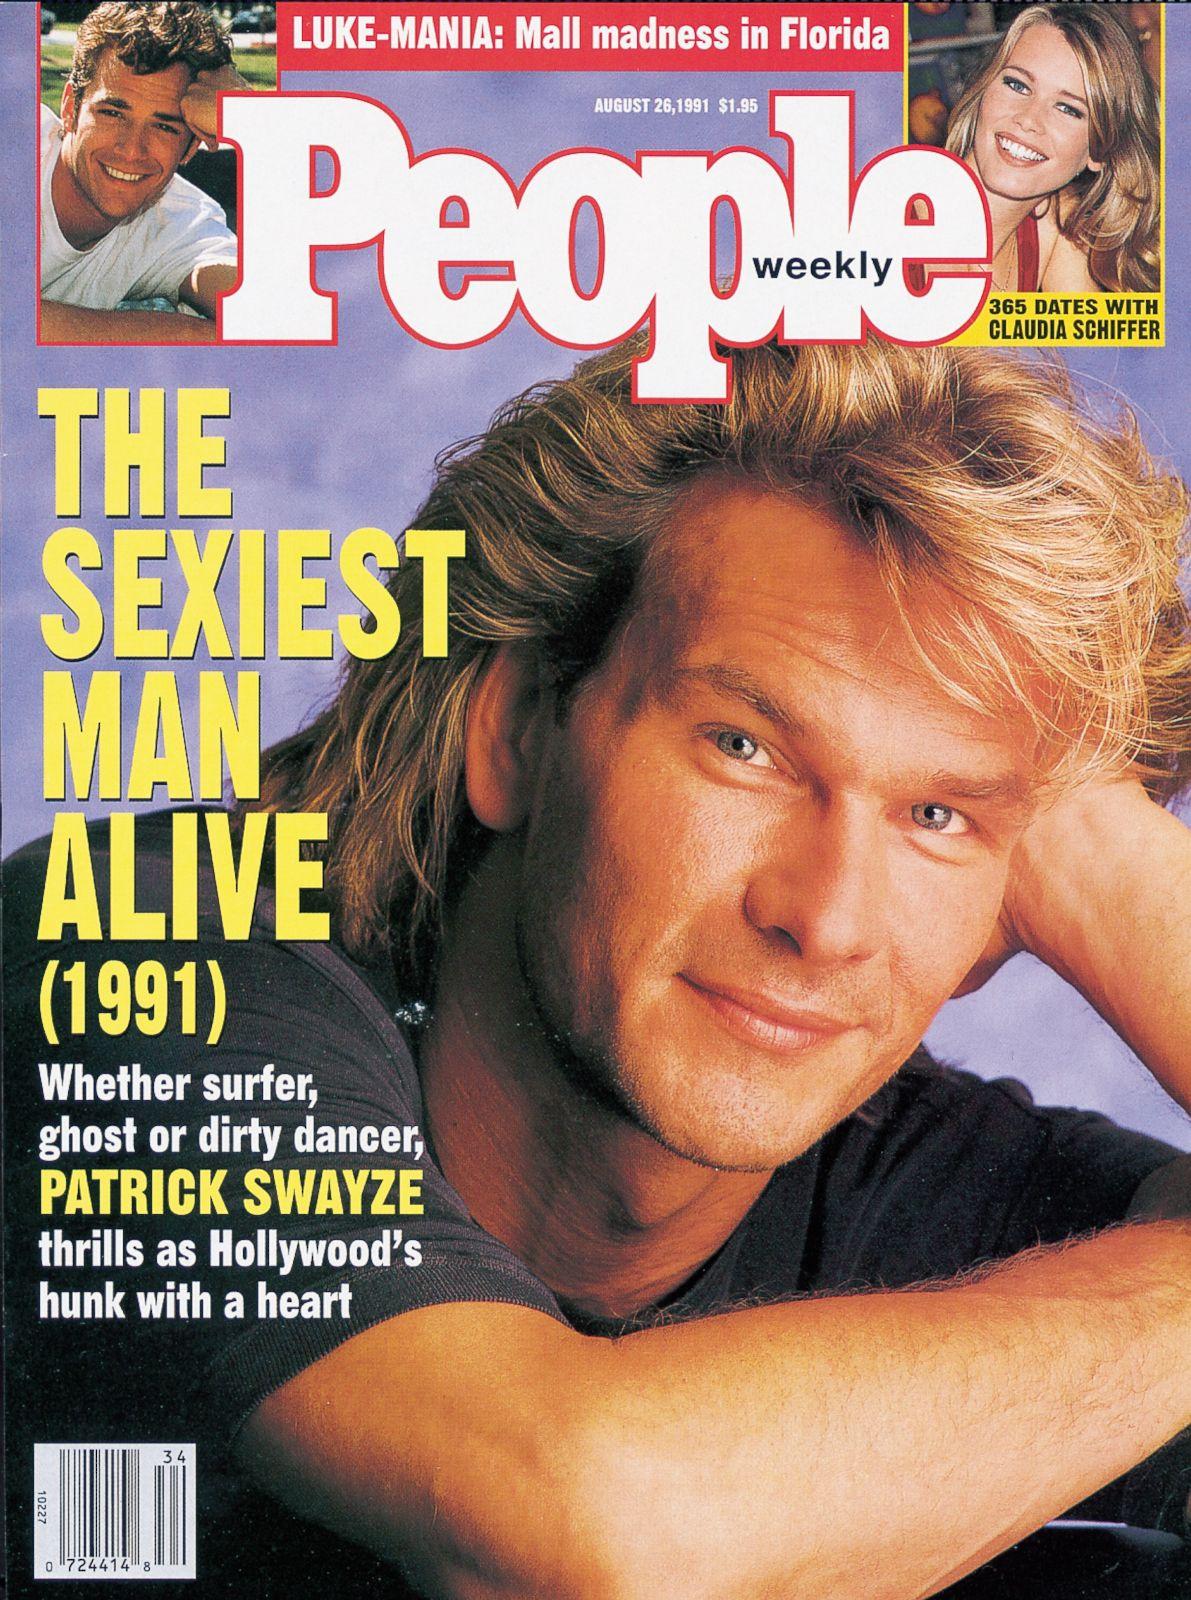 Sexiest man alive full list